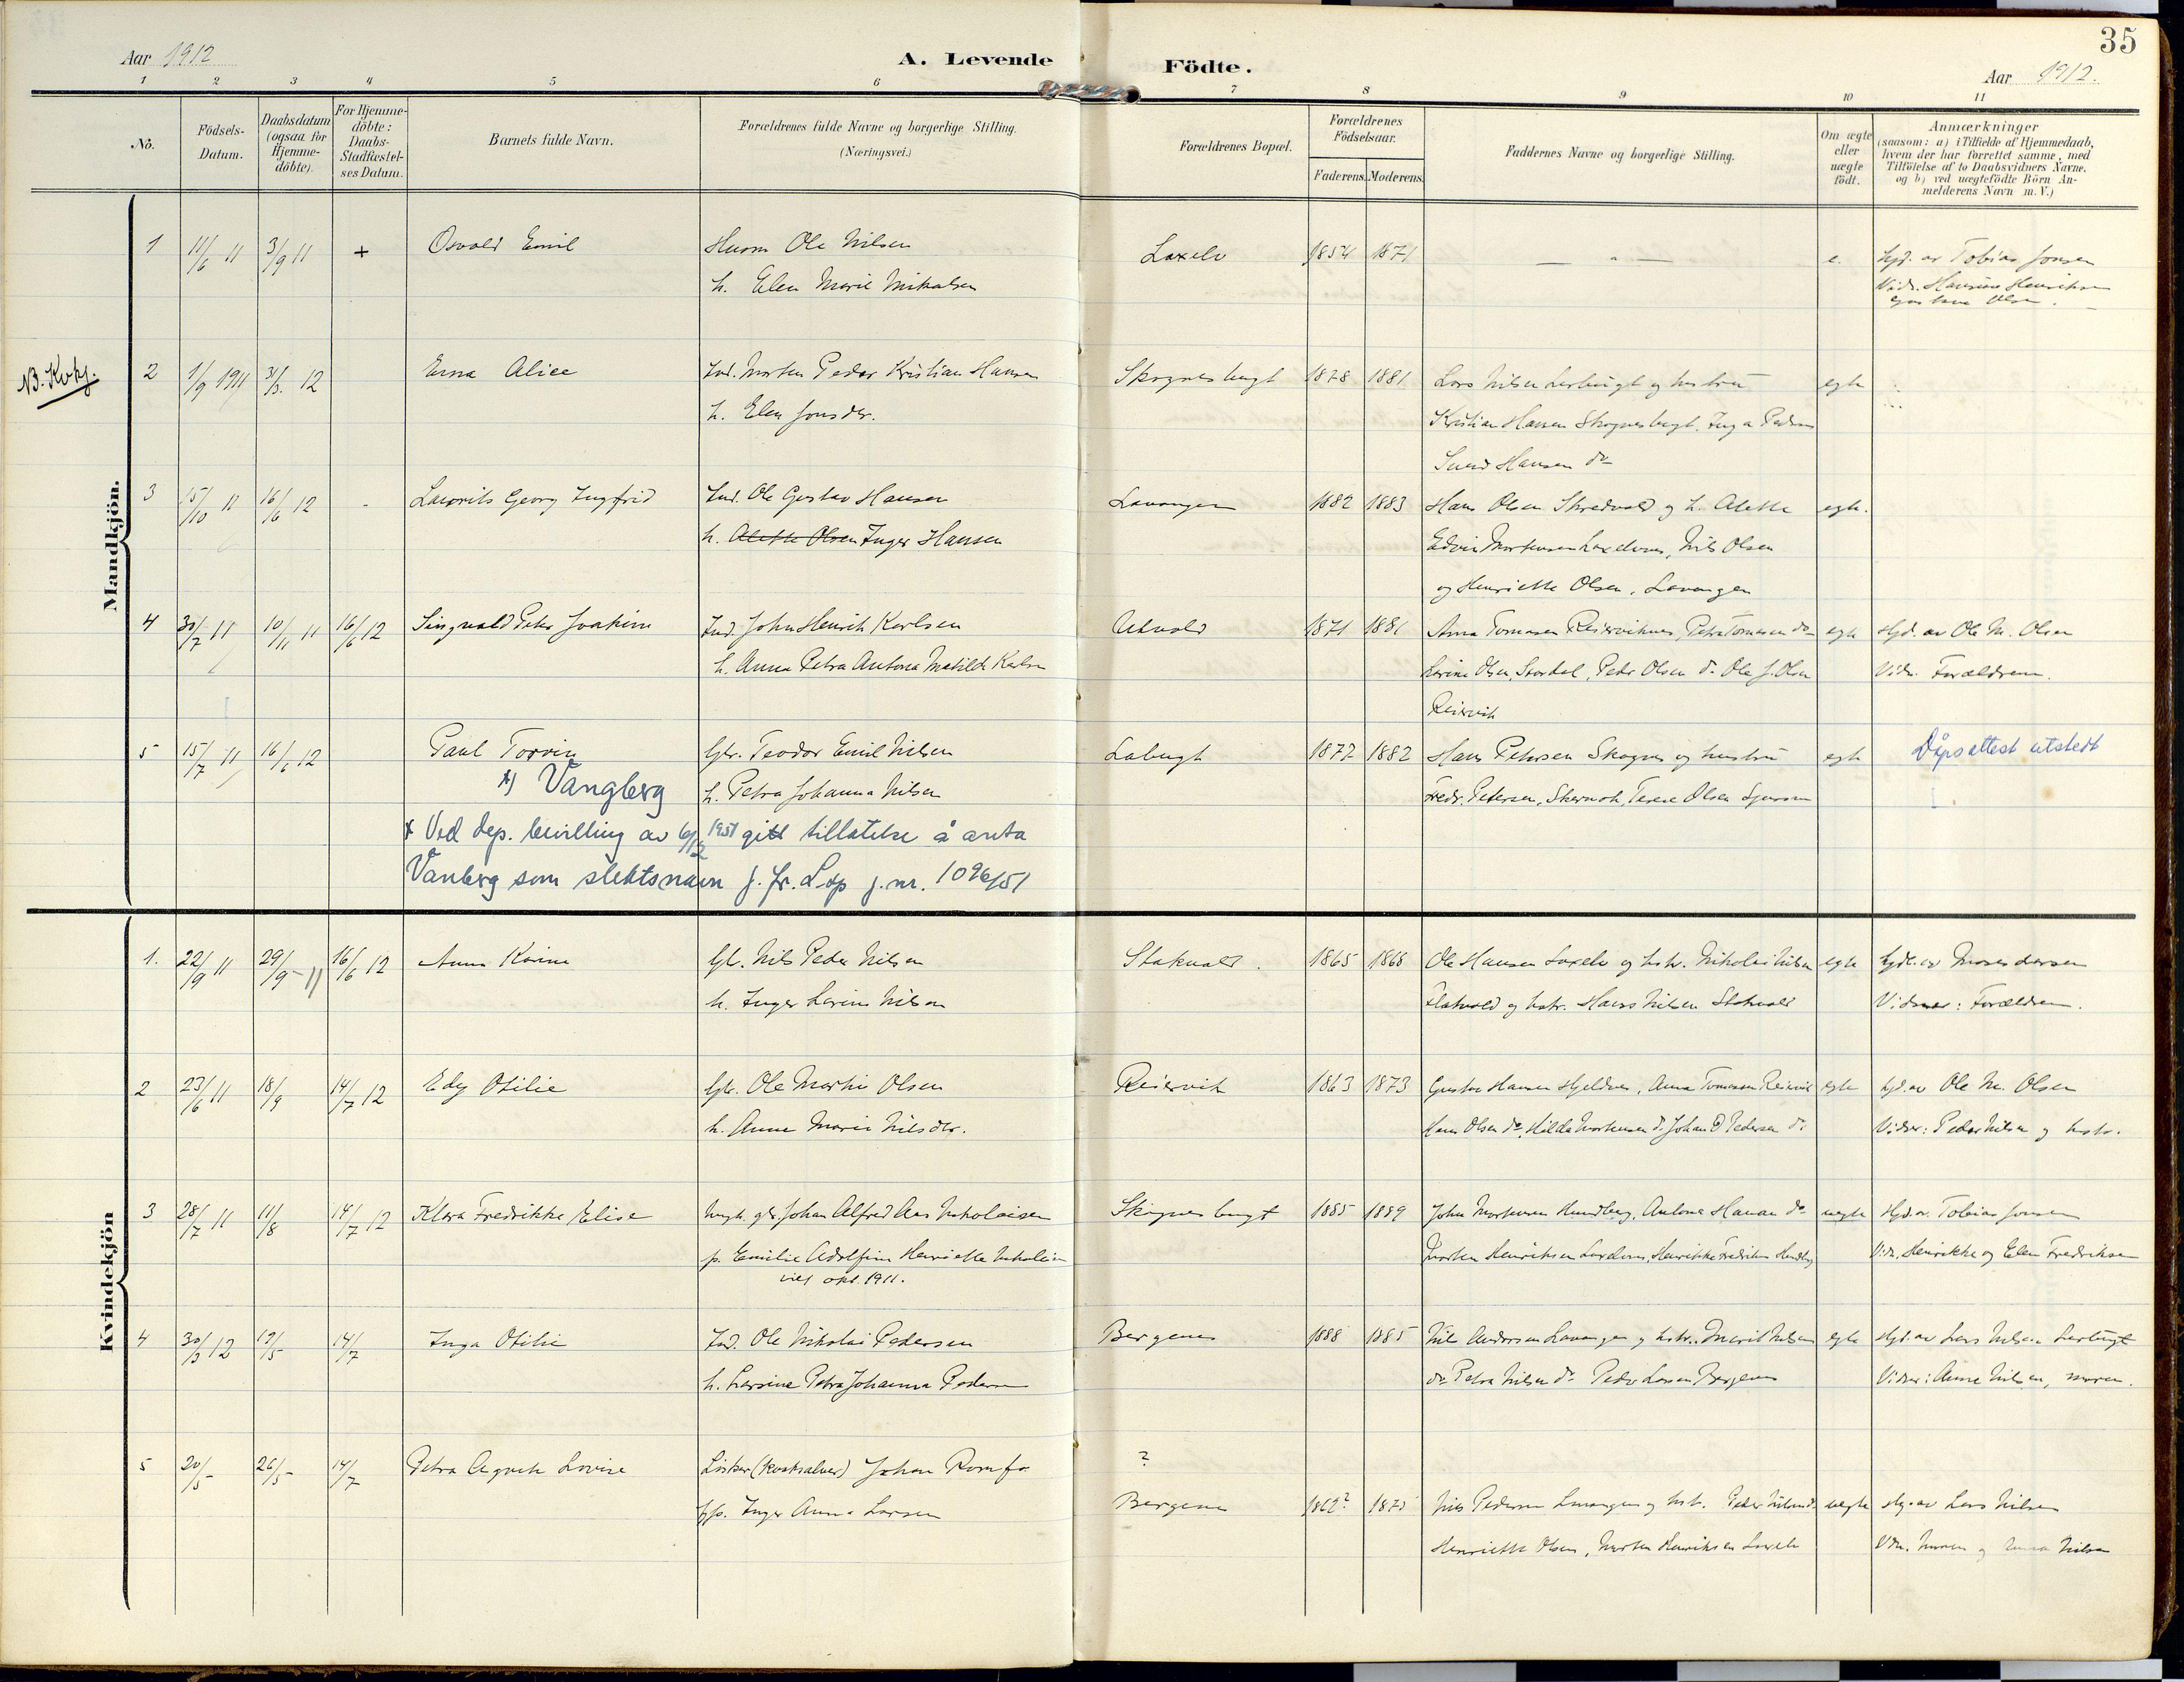 SATØ, Lyngen sokneprestembete, Ministerialbok nr. 14, 1905-1920, s. 35